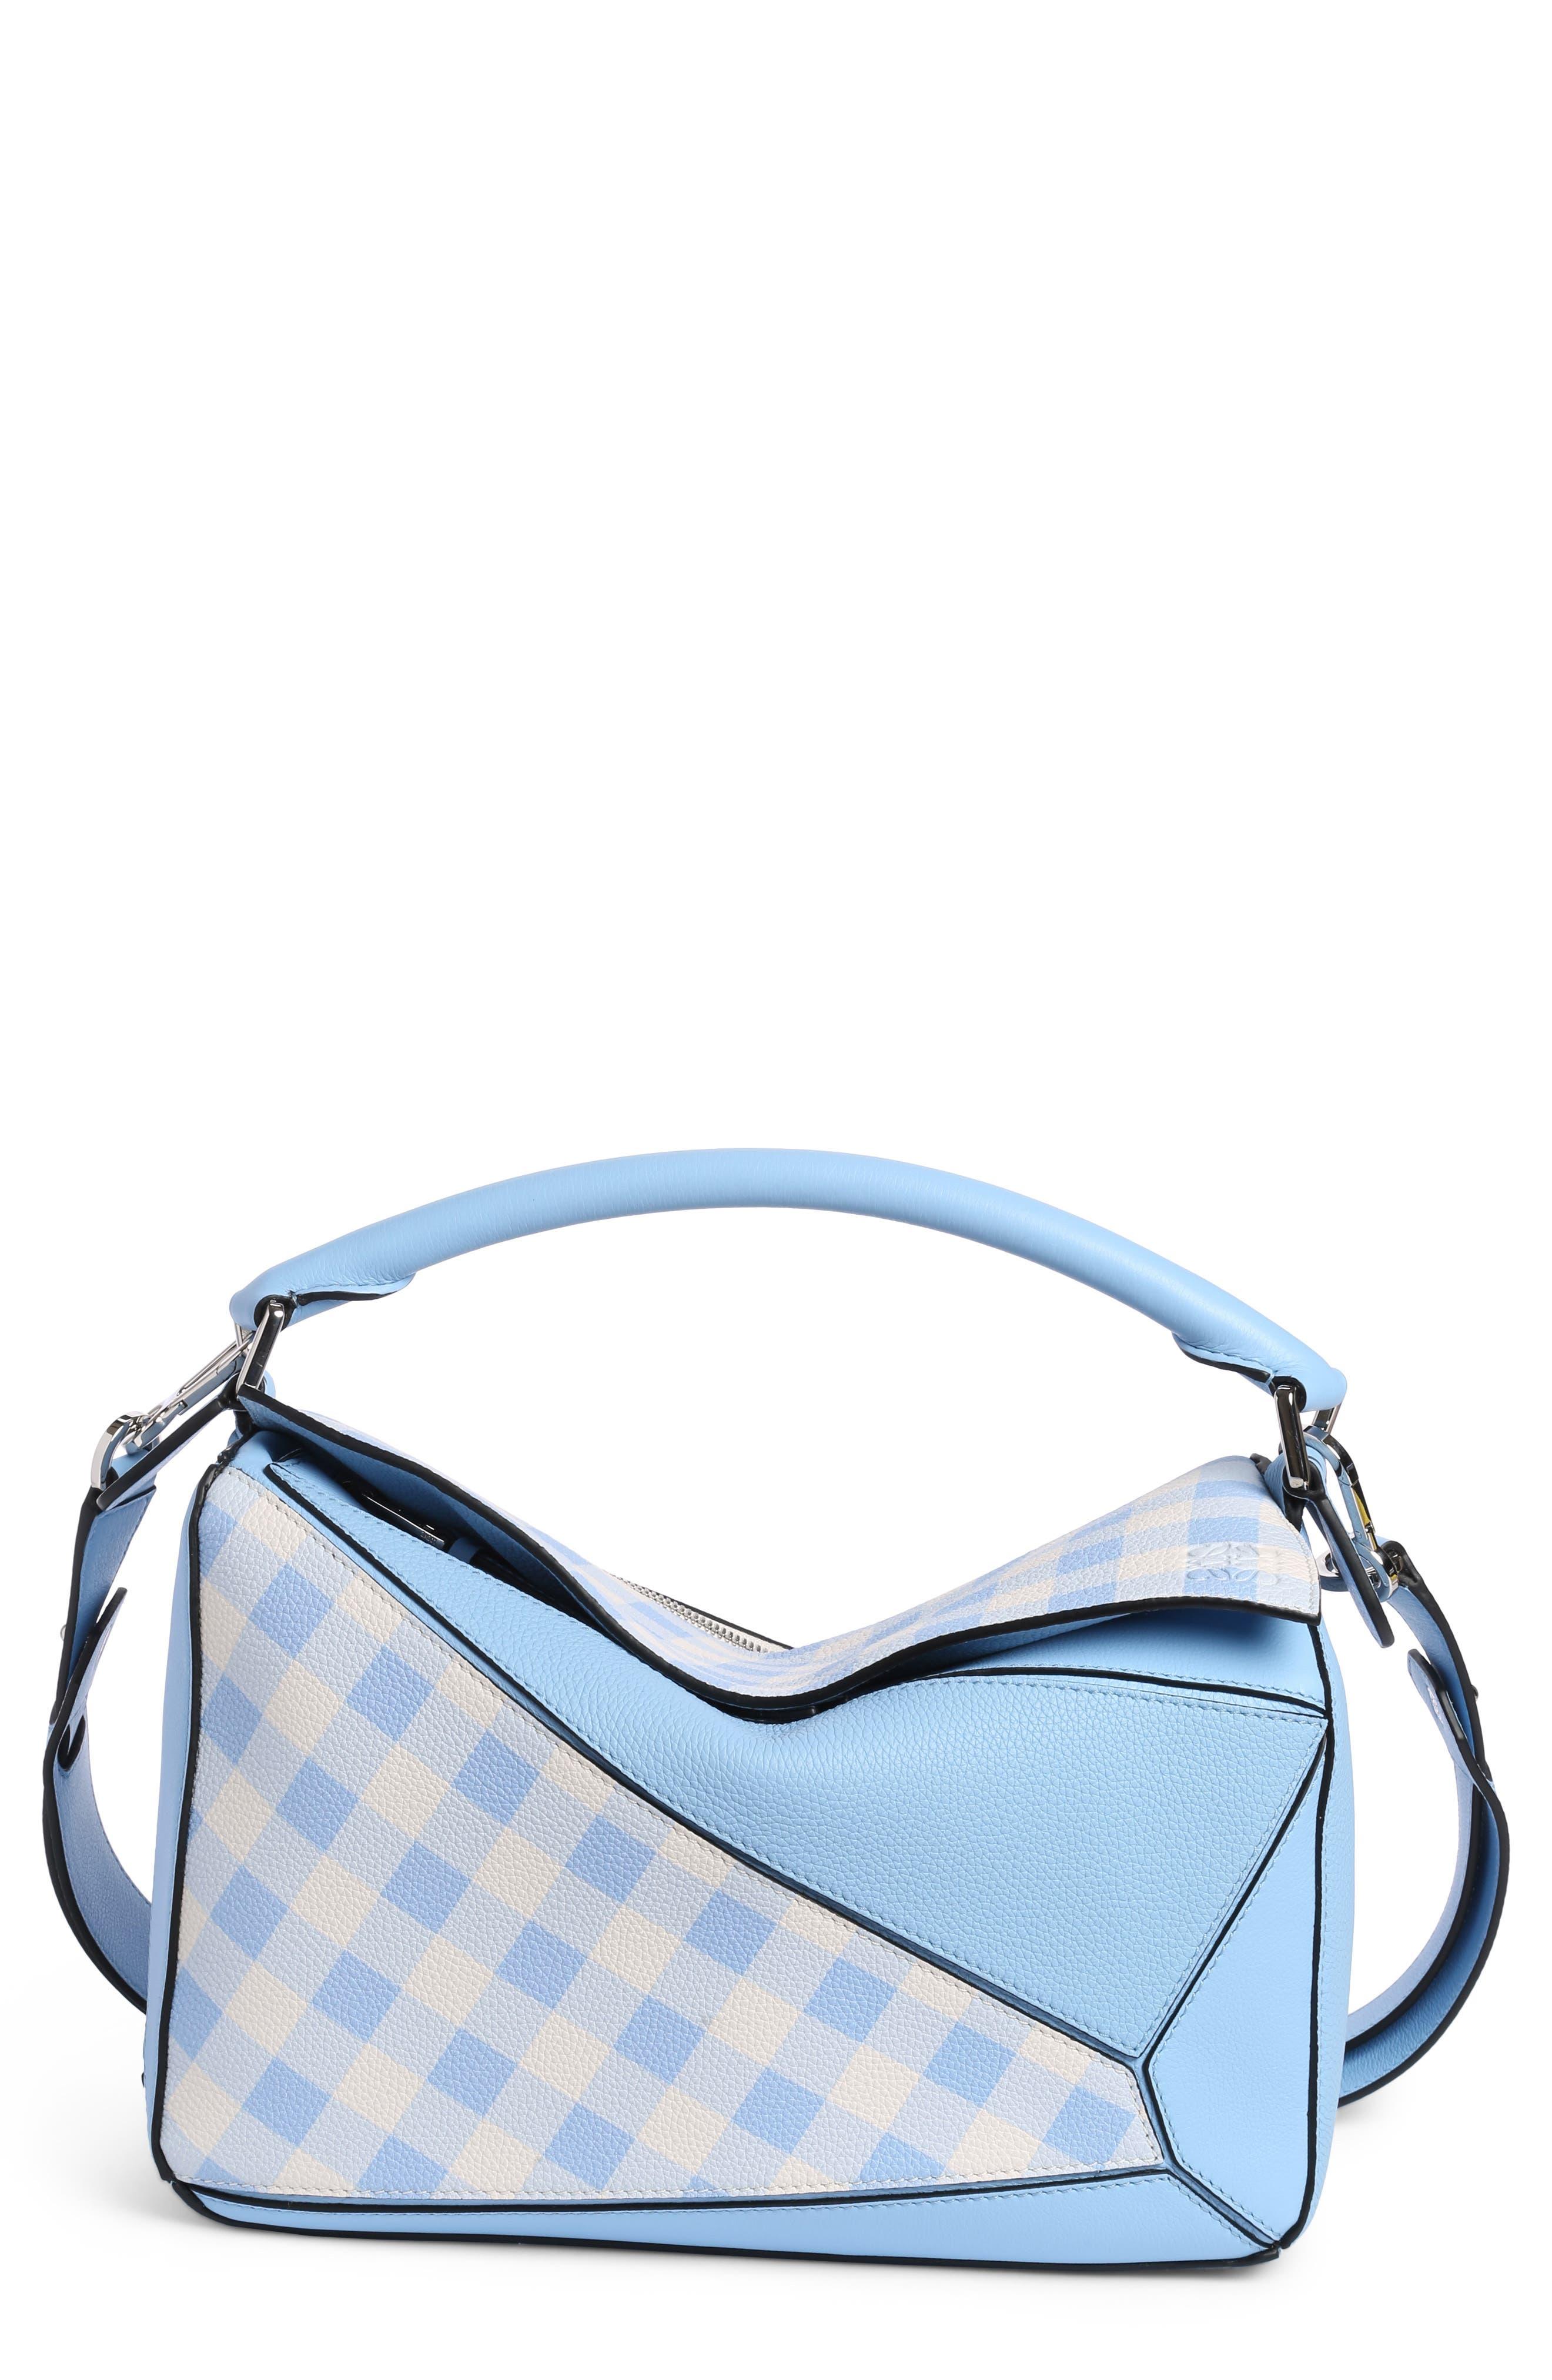 Main Image - Loewe Puzzle Gingham Calfskin Leather Bag